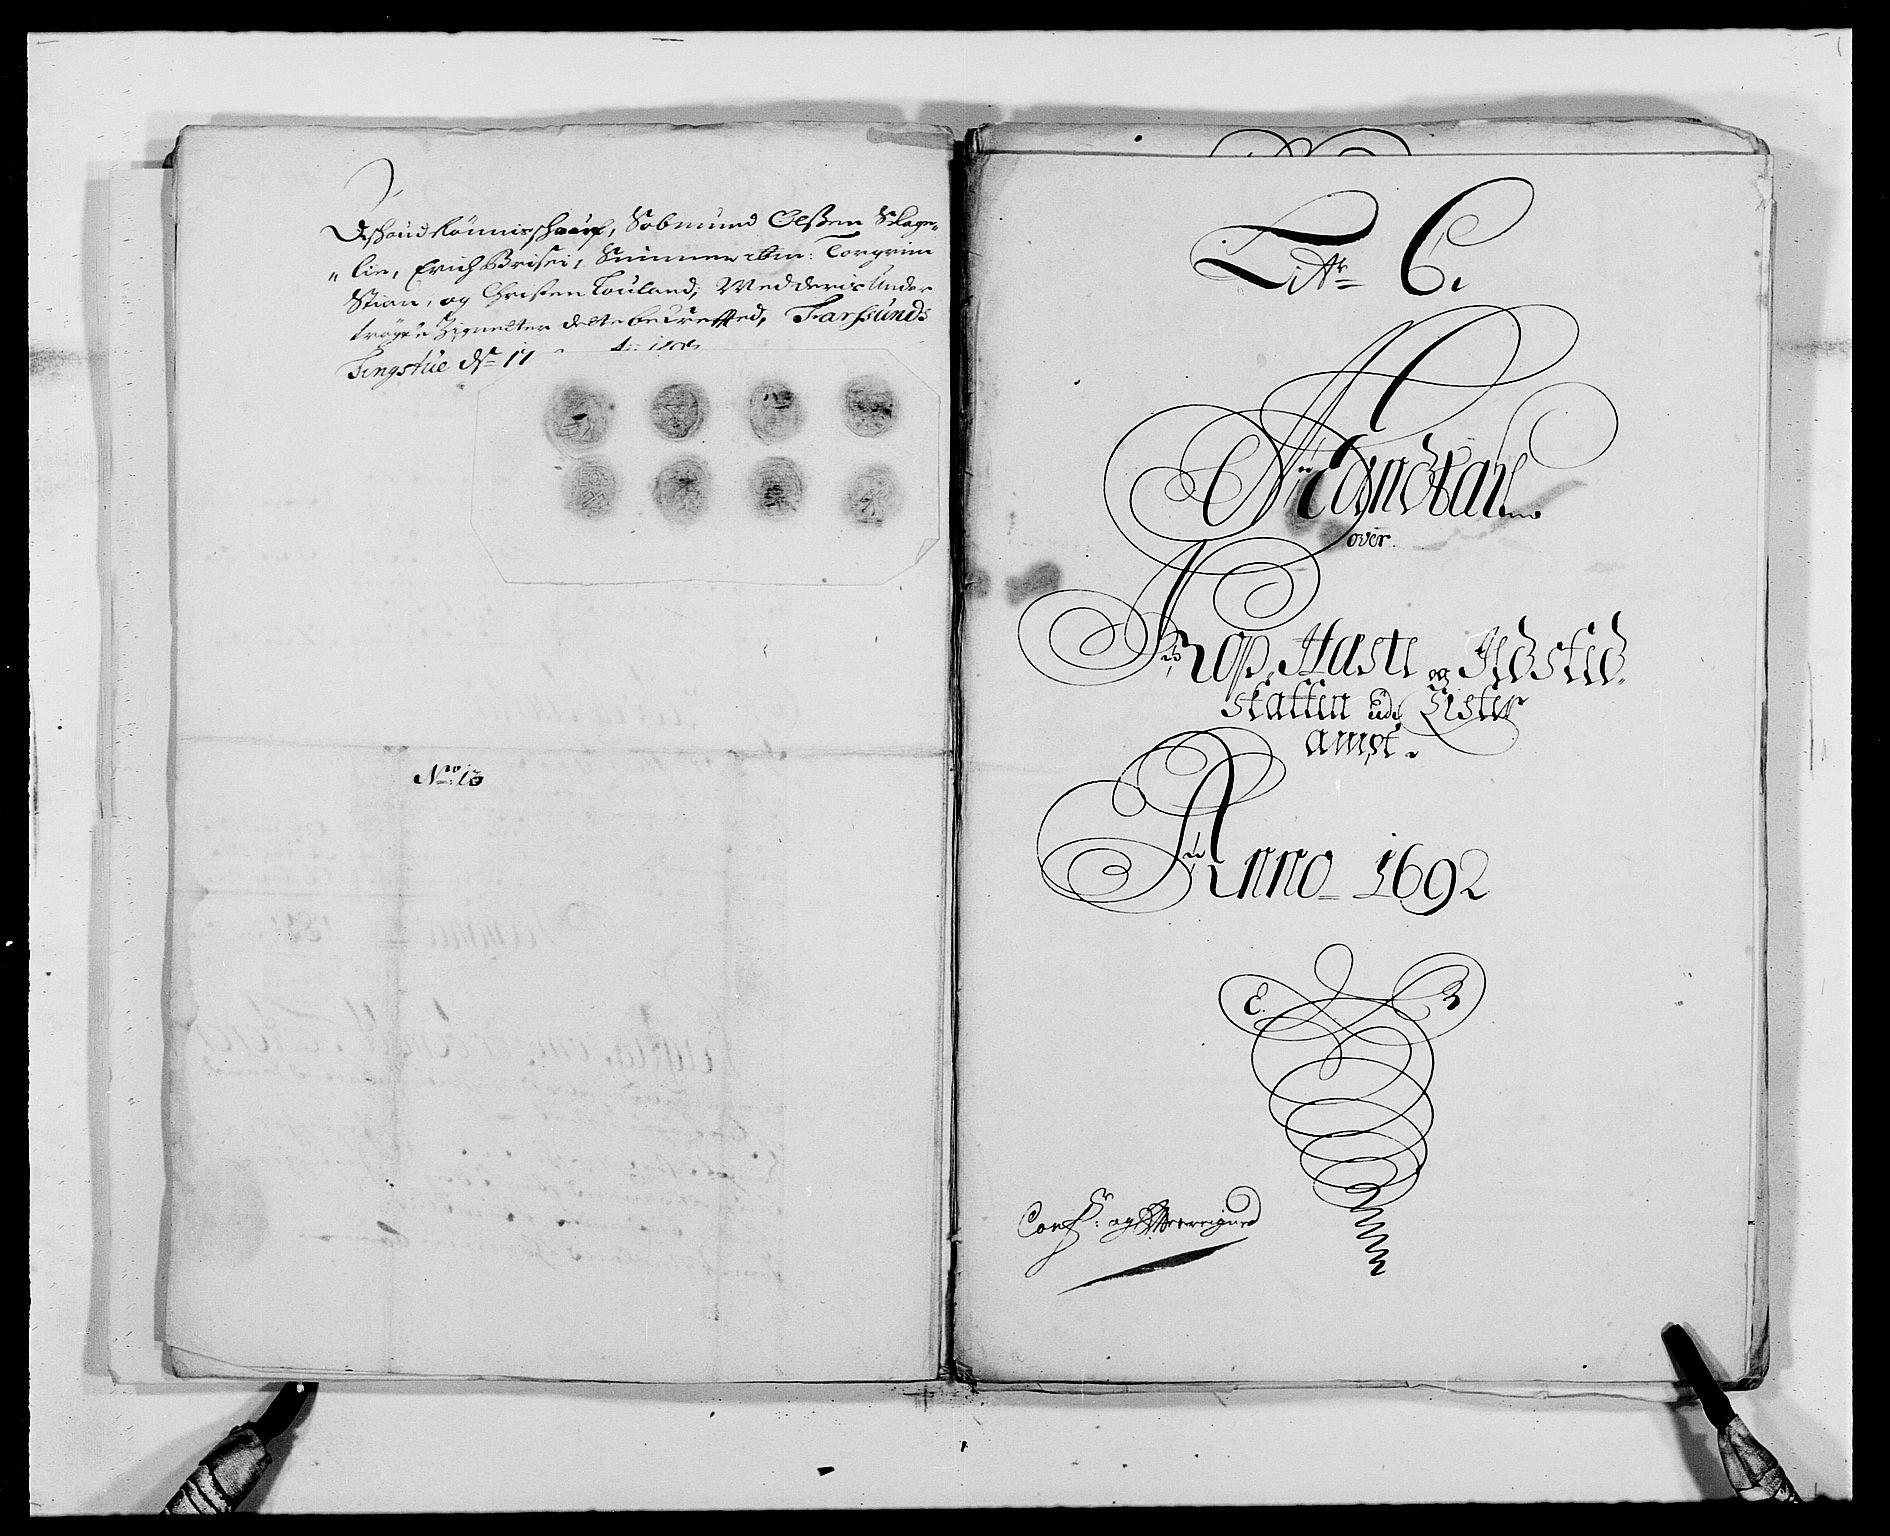 RA, Rentekammeret inntil 1814, Reviderte regnskaper, Fogderegnskap, R41/L2536: Fogderegnskap Lista, 1690-1693, s. 208